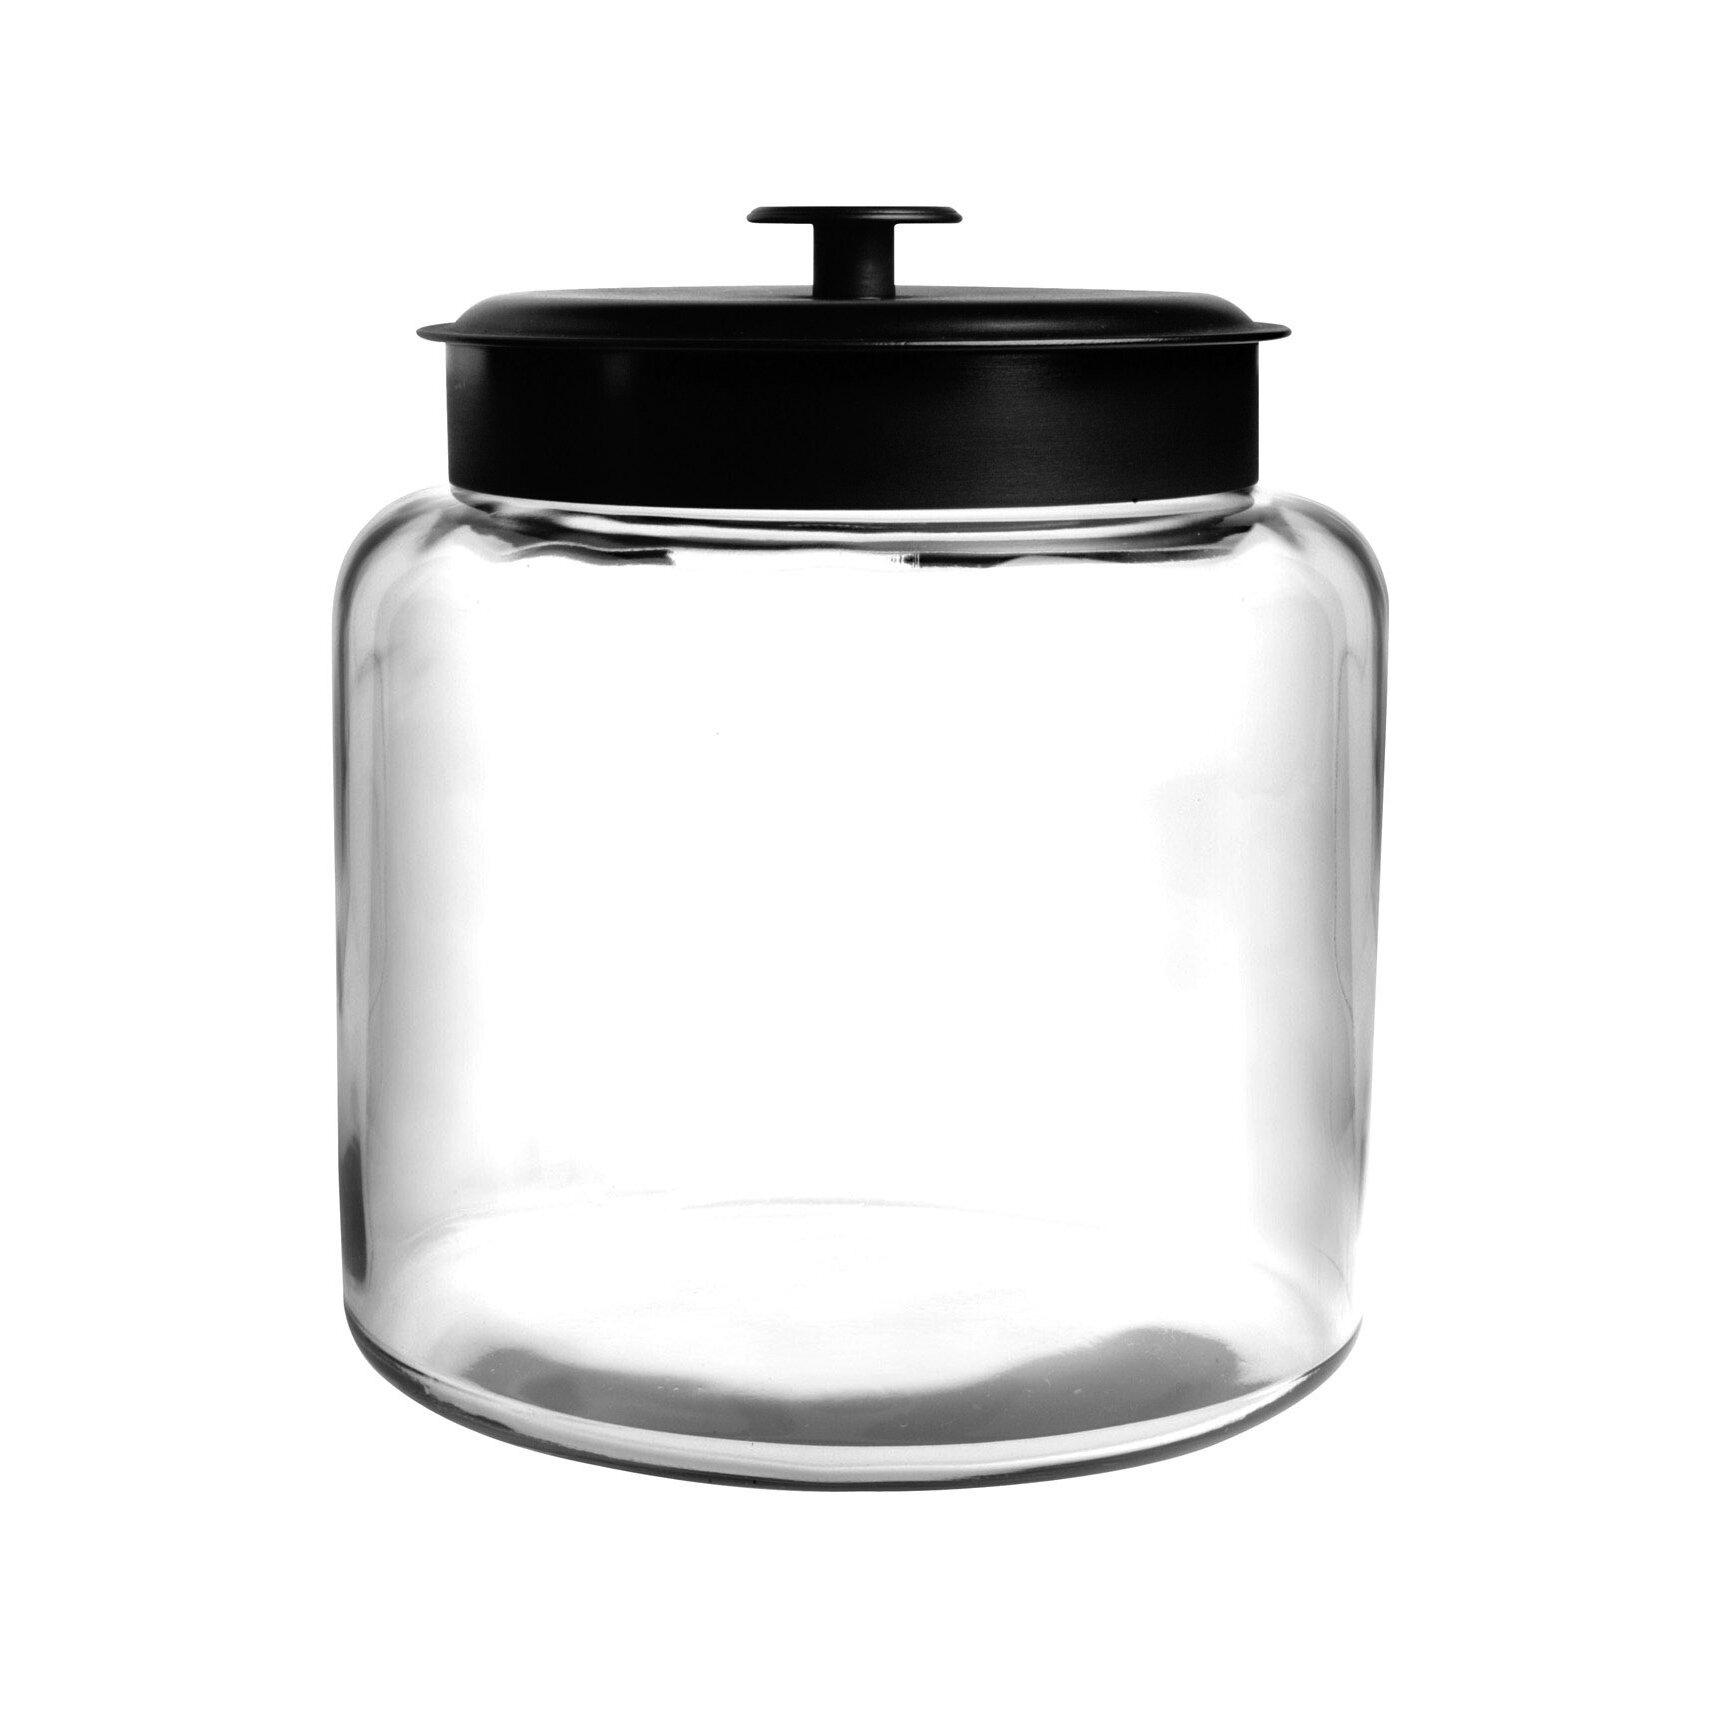 100 black ceramic kitchen canisters best 25 tea coffee black ceramic kitchen canisters canisters canister sets kitchen canisters glass canisters